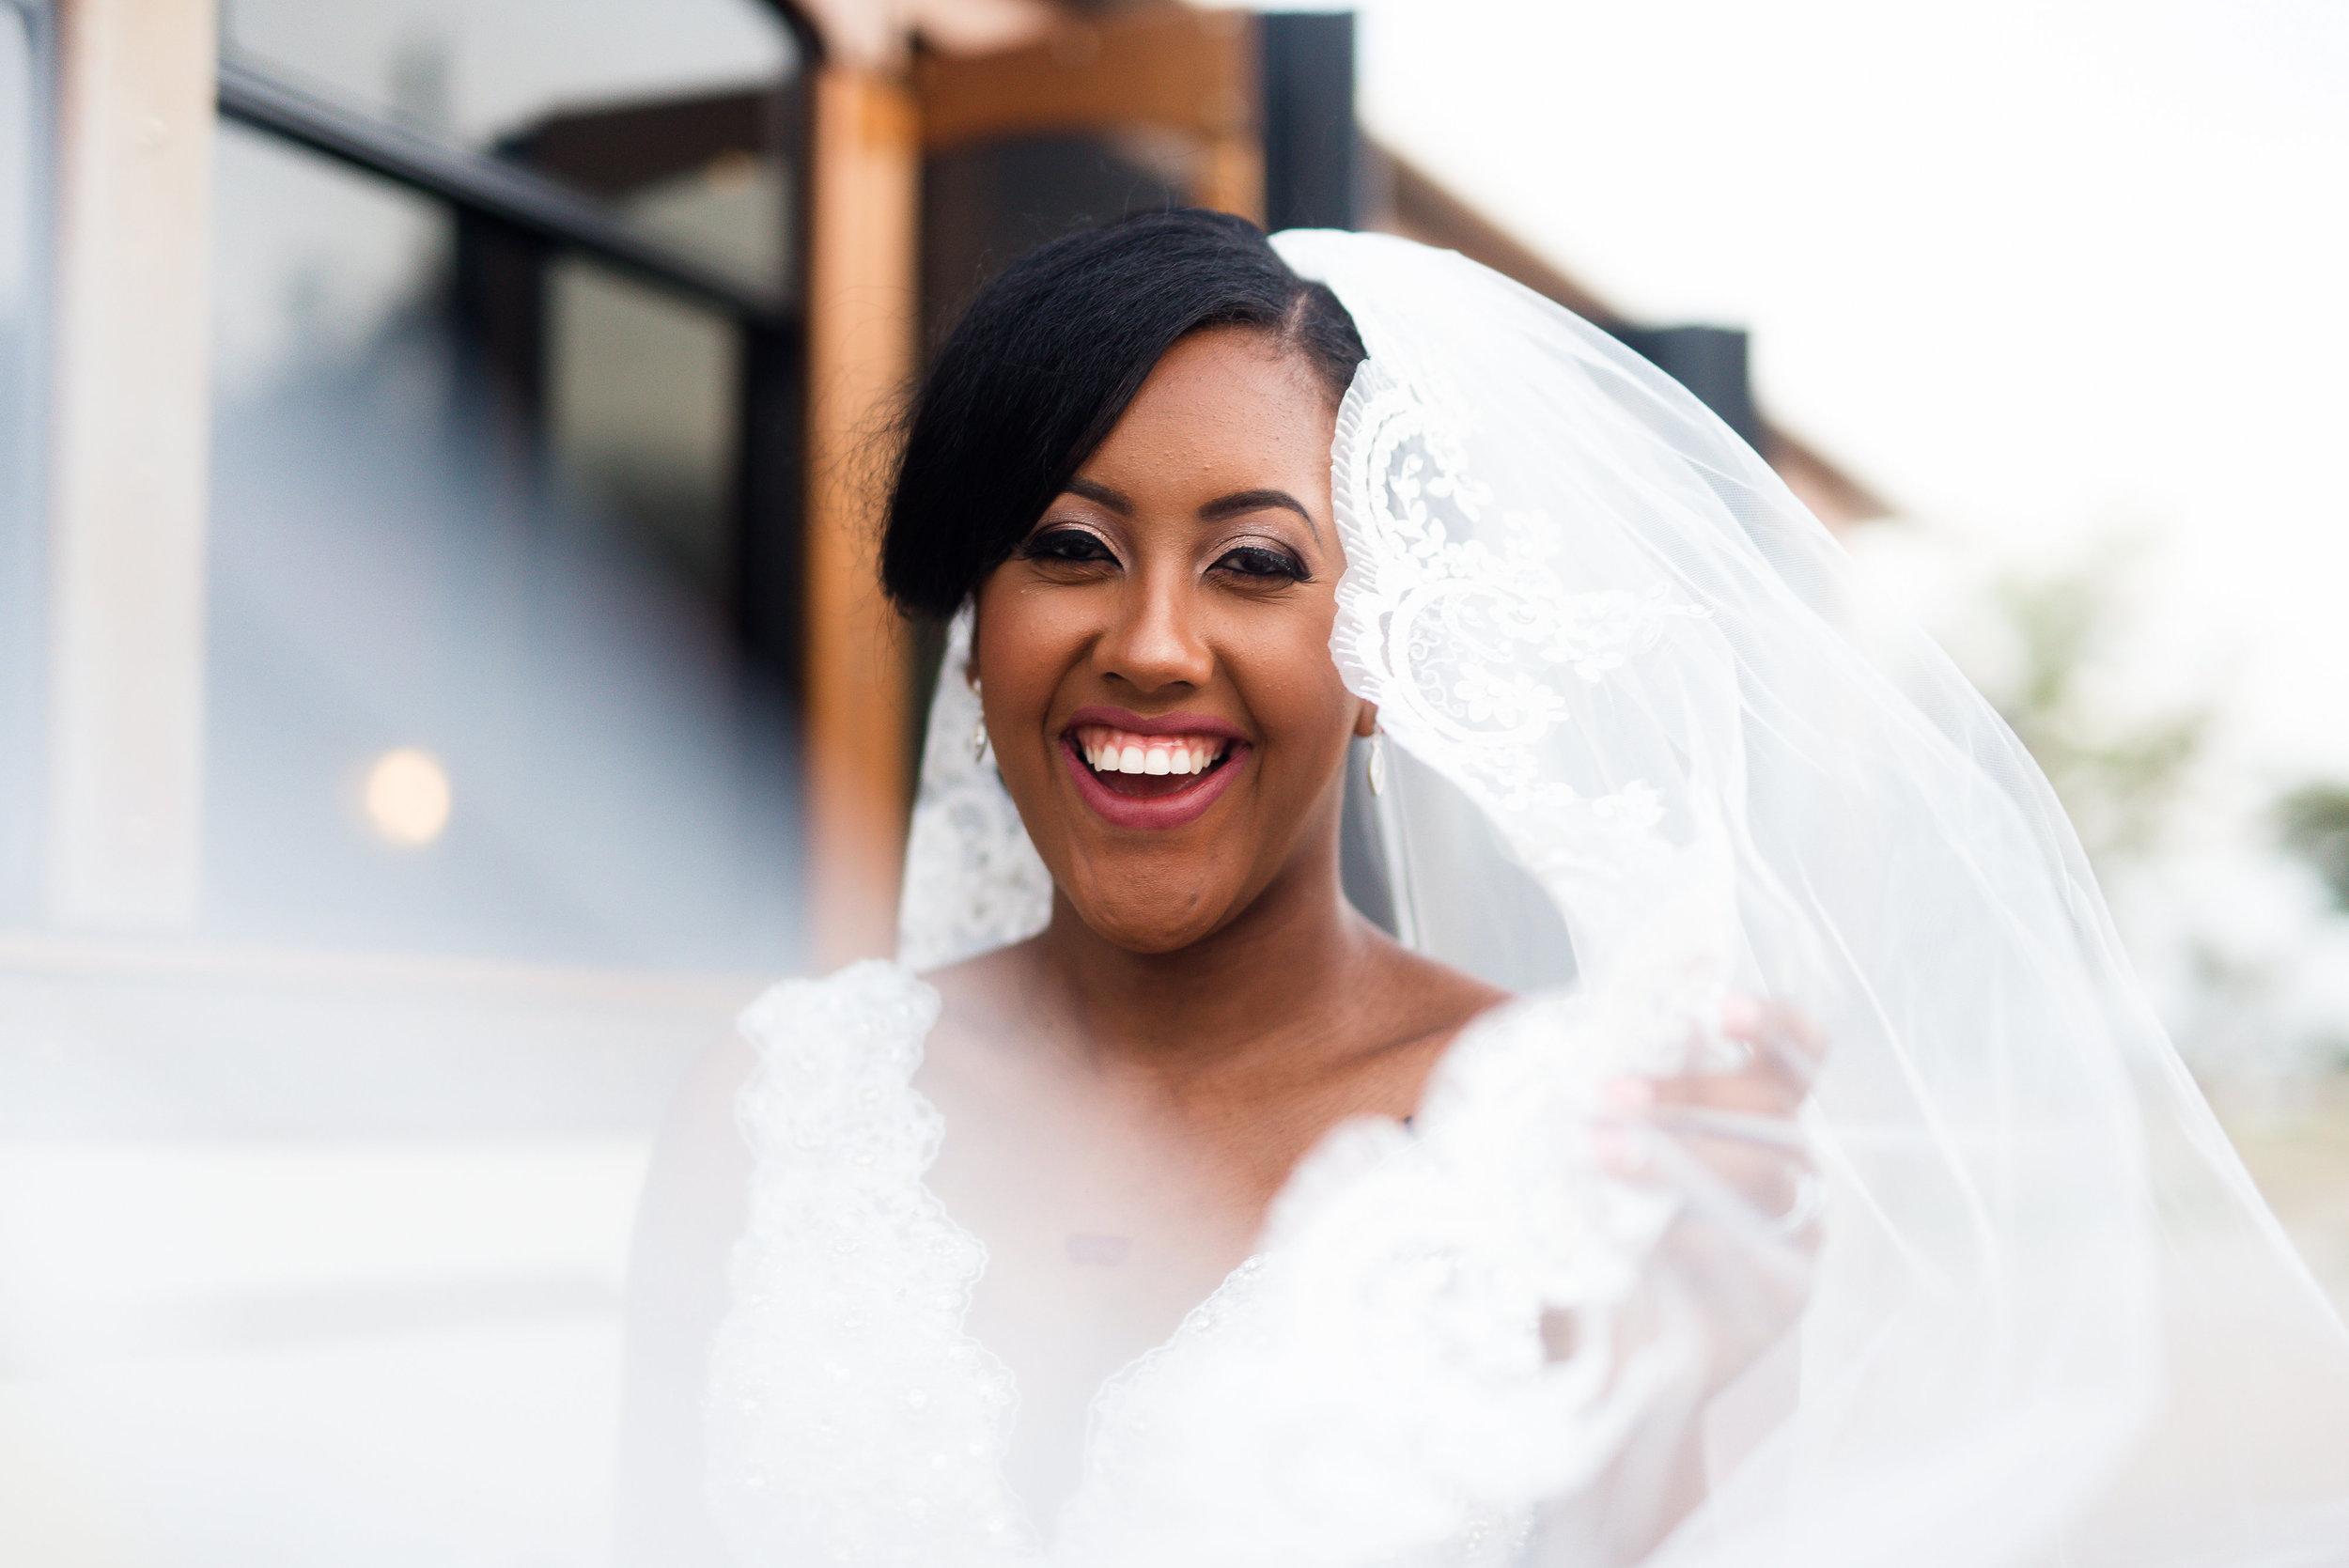 TC-Jessica-Garr-Pharris-Photography-Real-Wedding-26.jpg